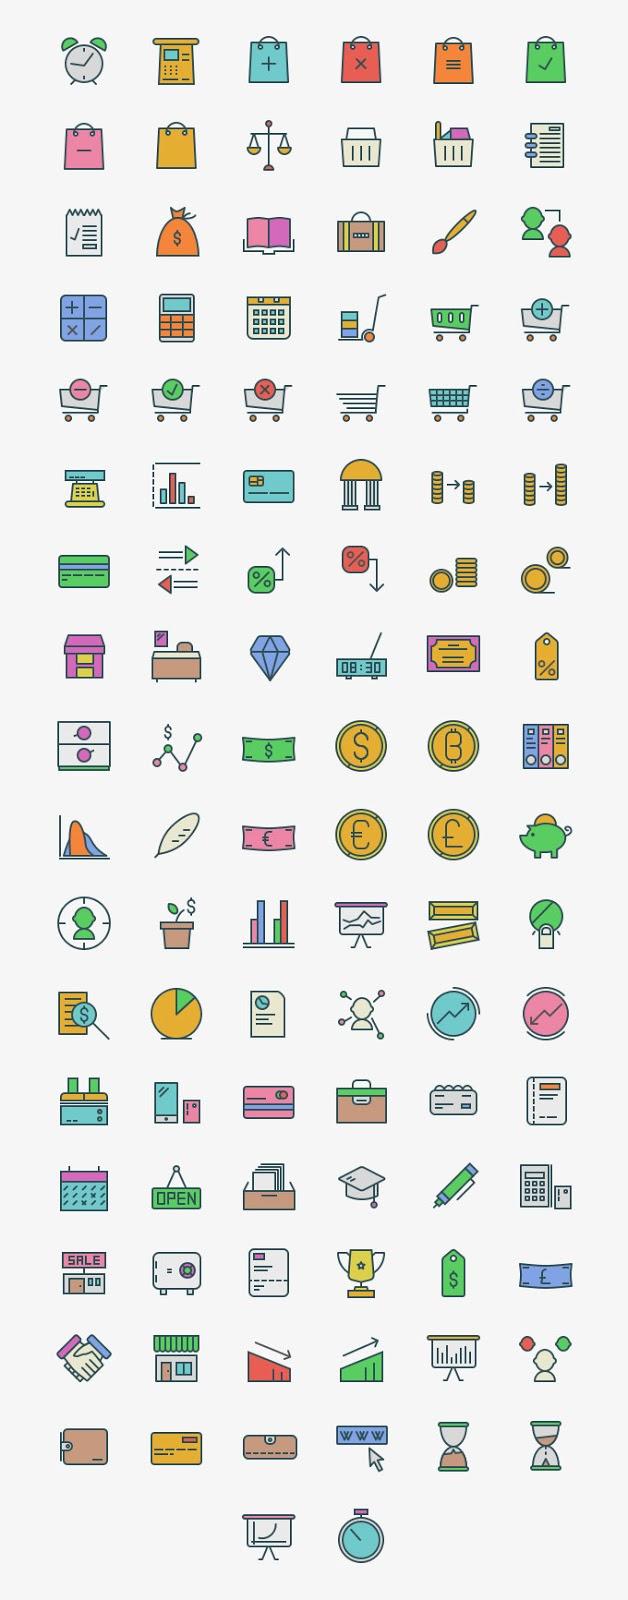 100+ Free Marketing Icons